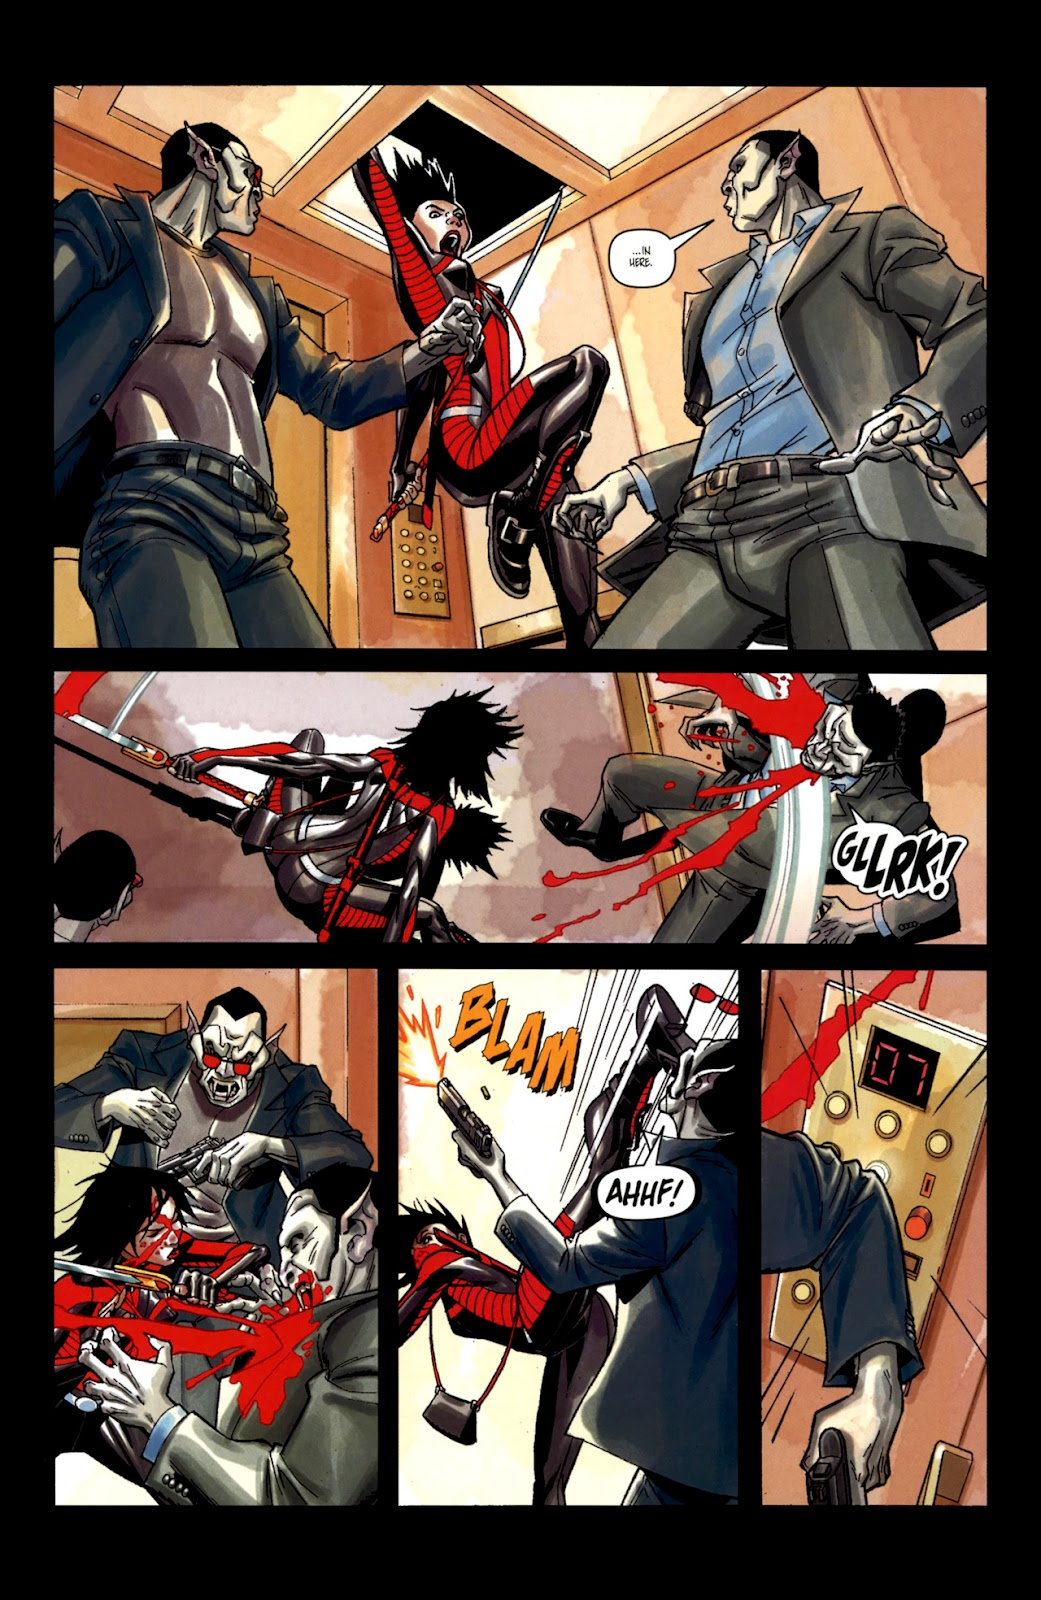 Read online Shinku comic -  Issue #2 - 12